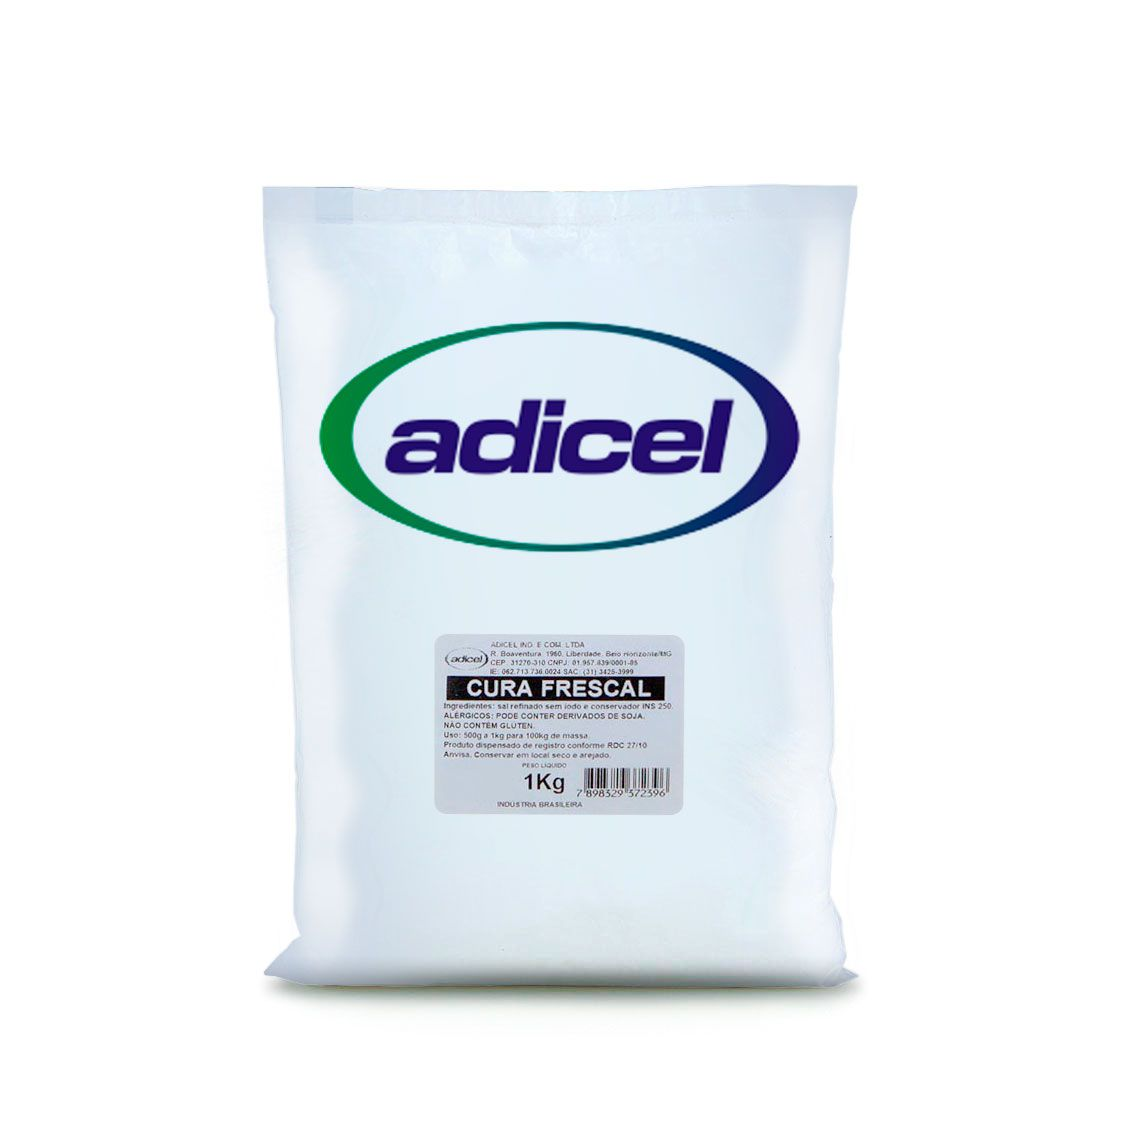 Cura Frescal (Sal De Cura 1) - 1 kg